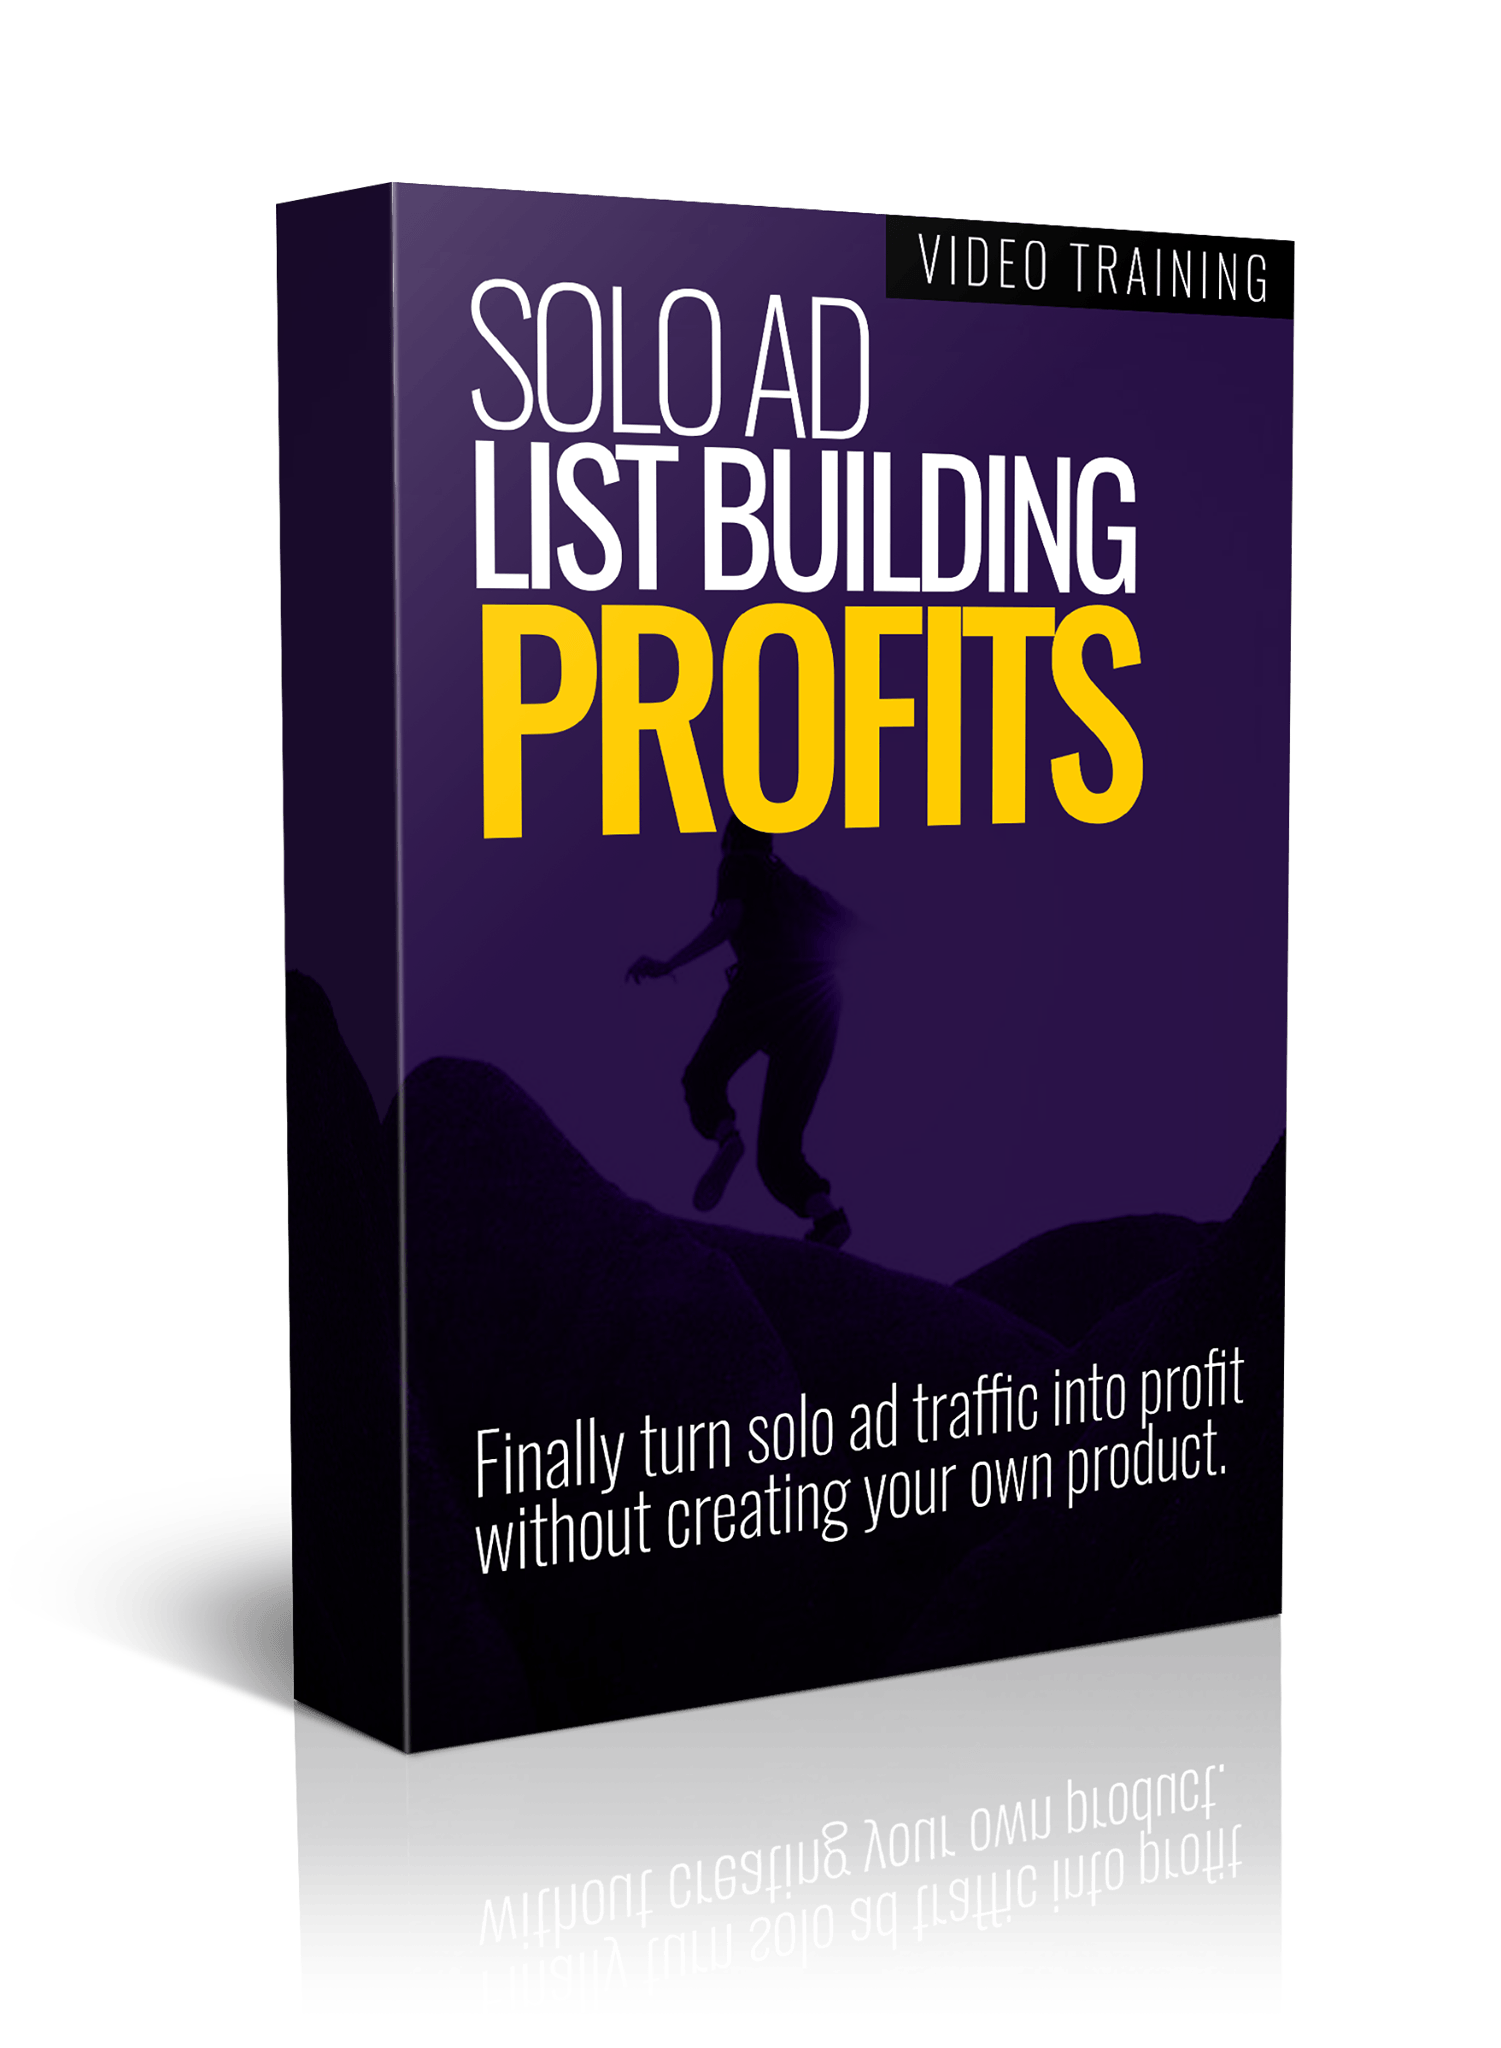 Solo Ad List Building Profits